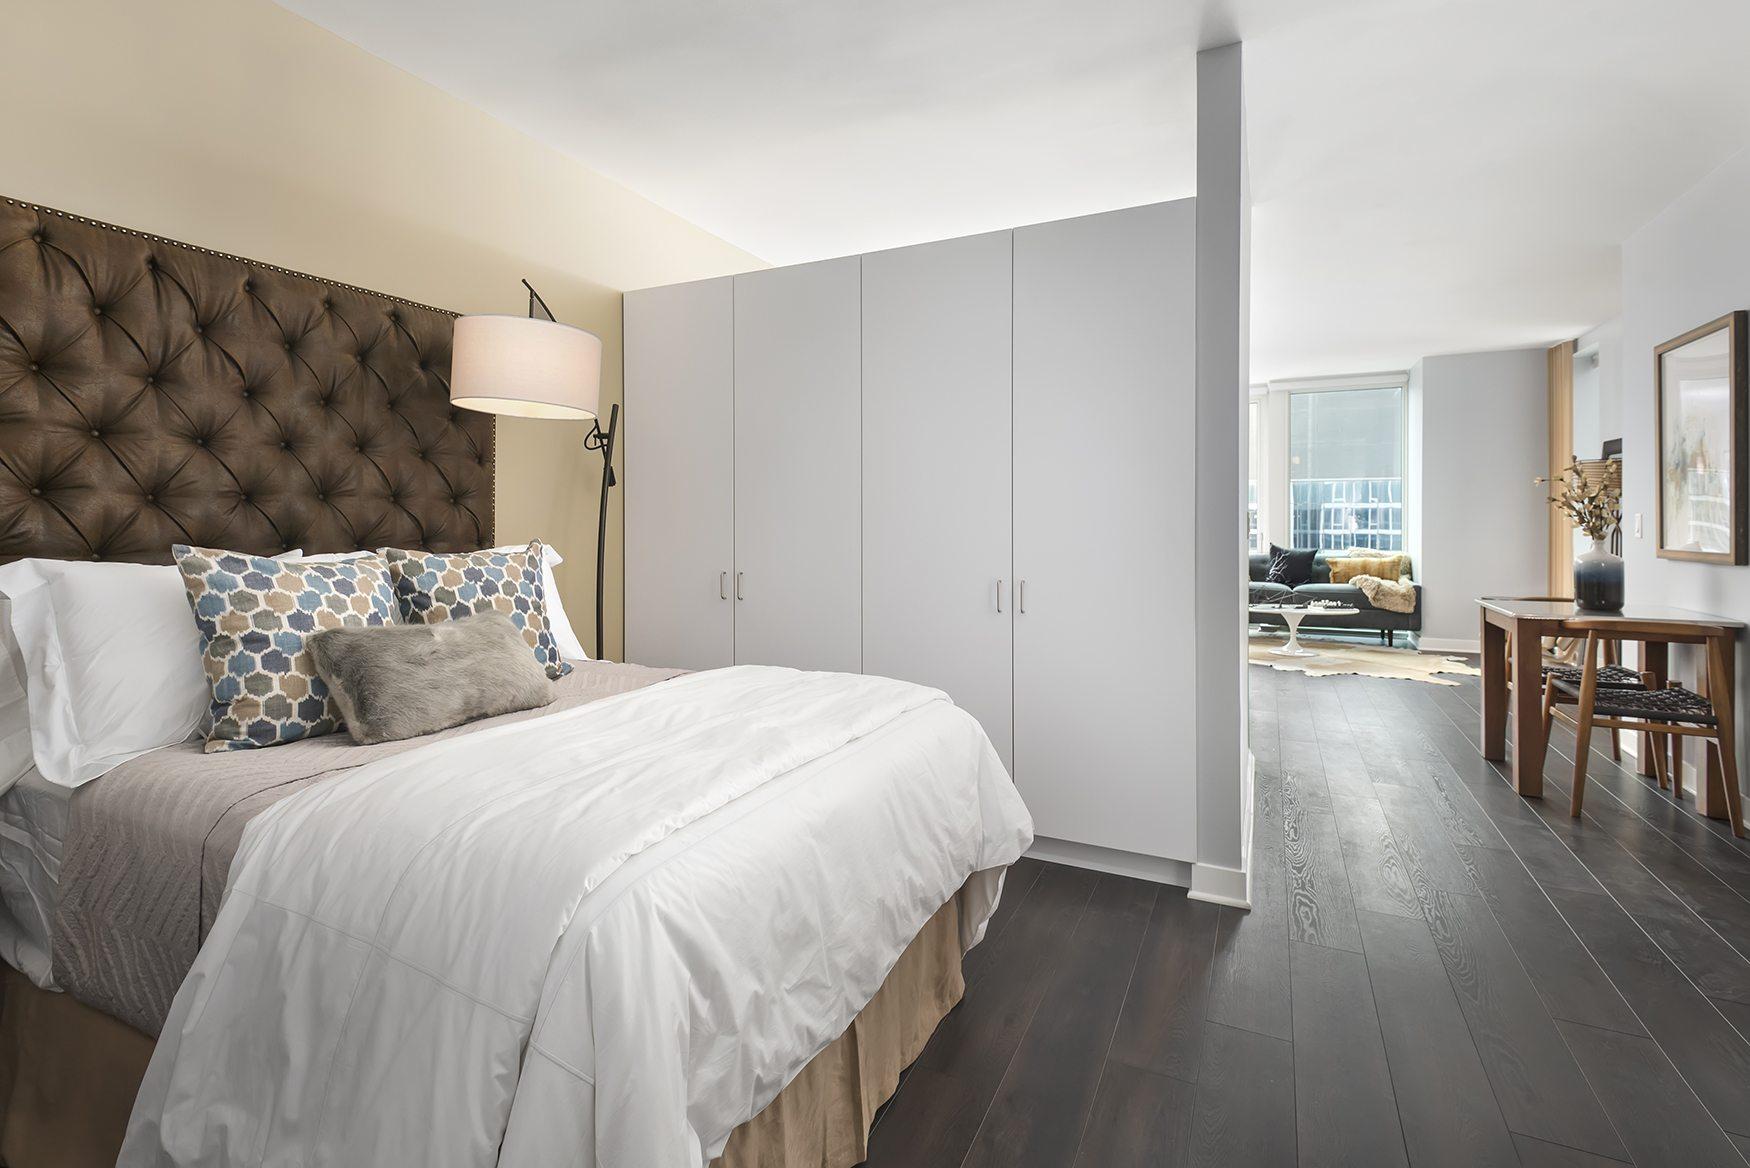 Apartemen Tipe Studio Convertible